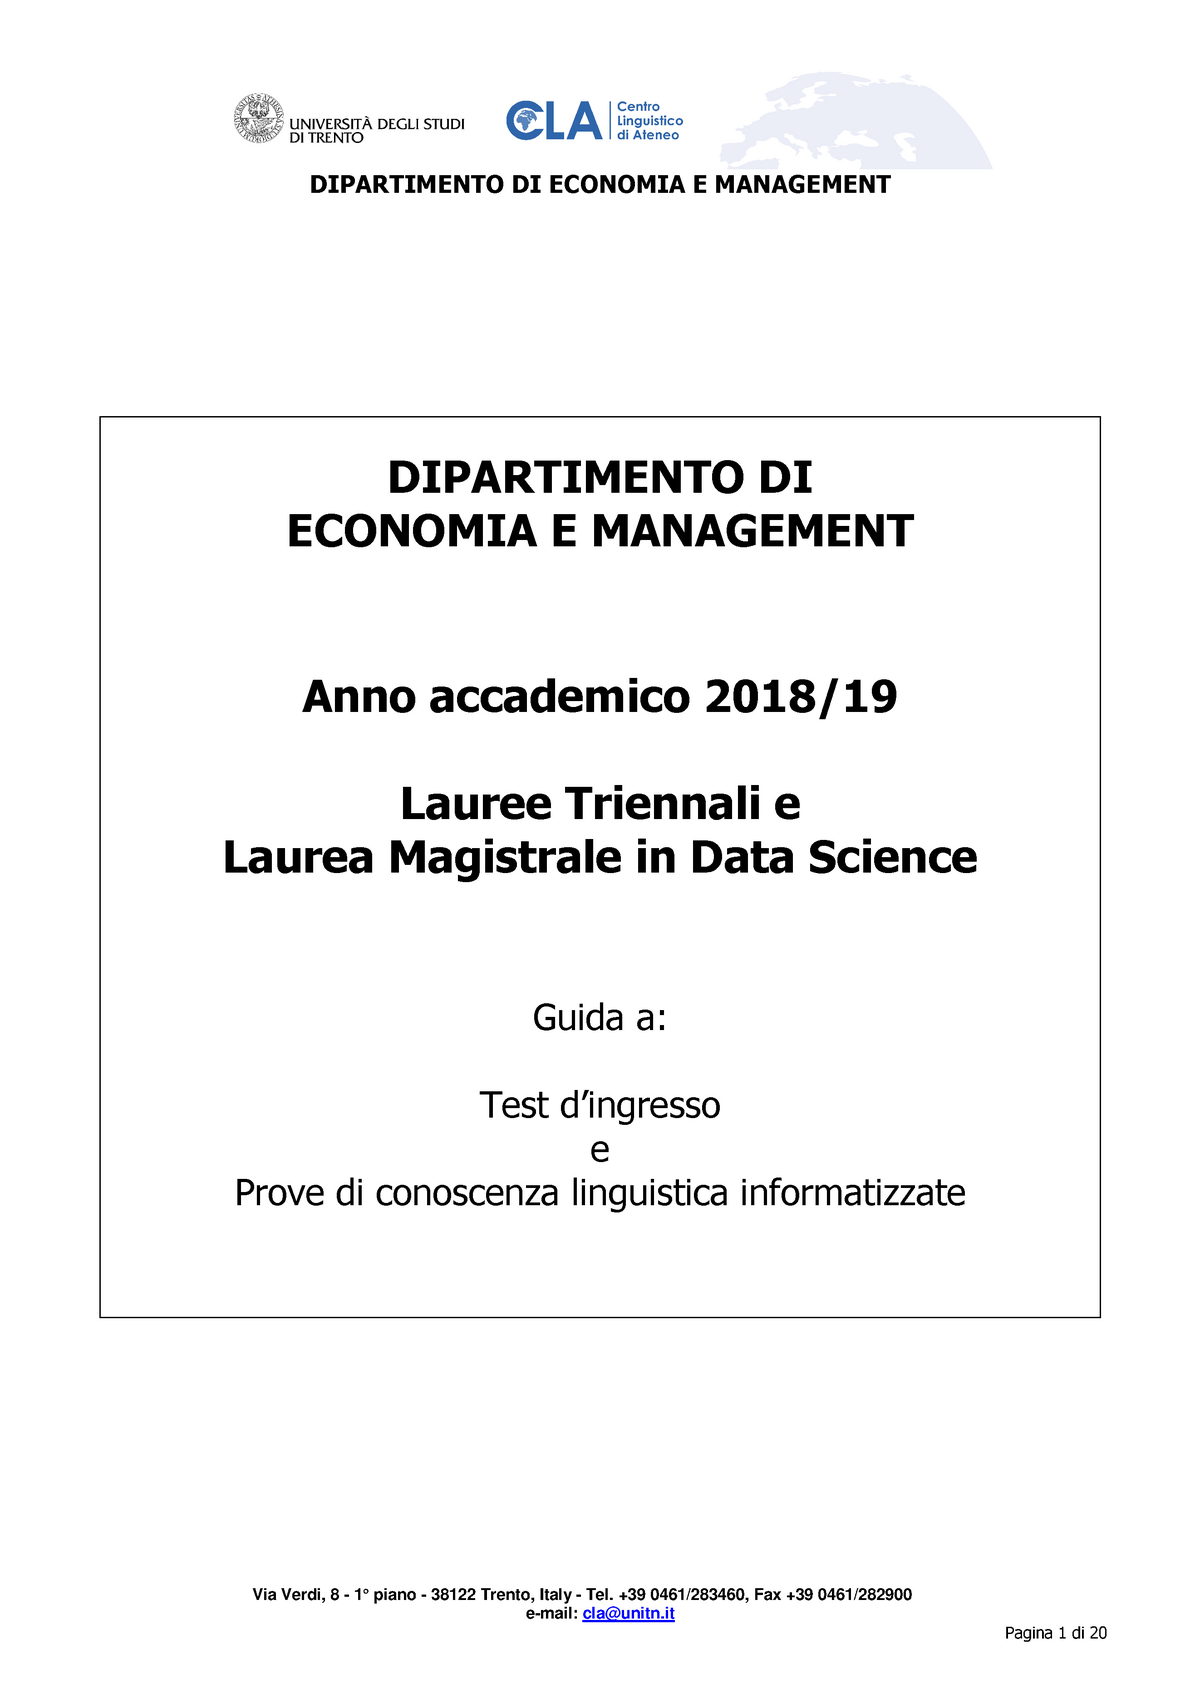 Unitn Calendario Accademico.Dipartimento Di Economia E Management A A 18 19 120060